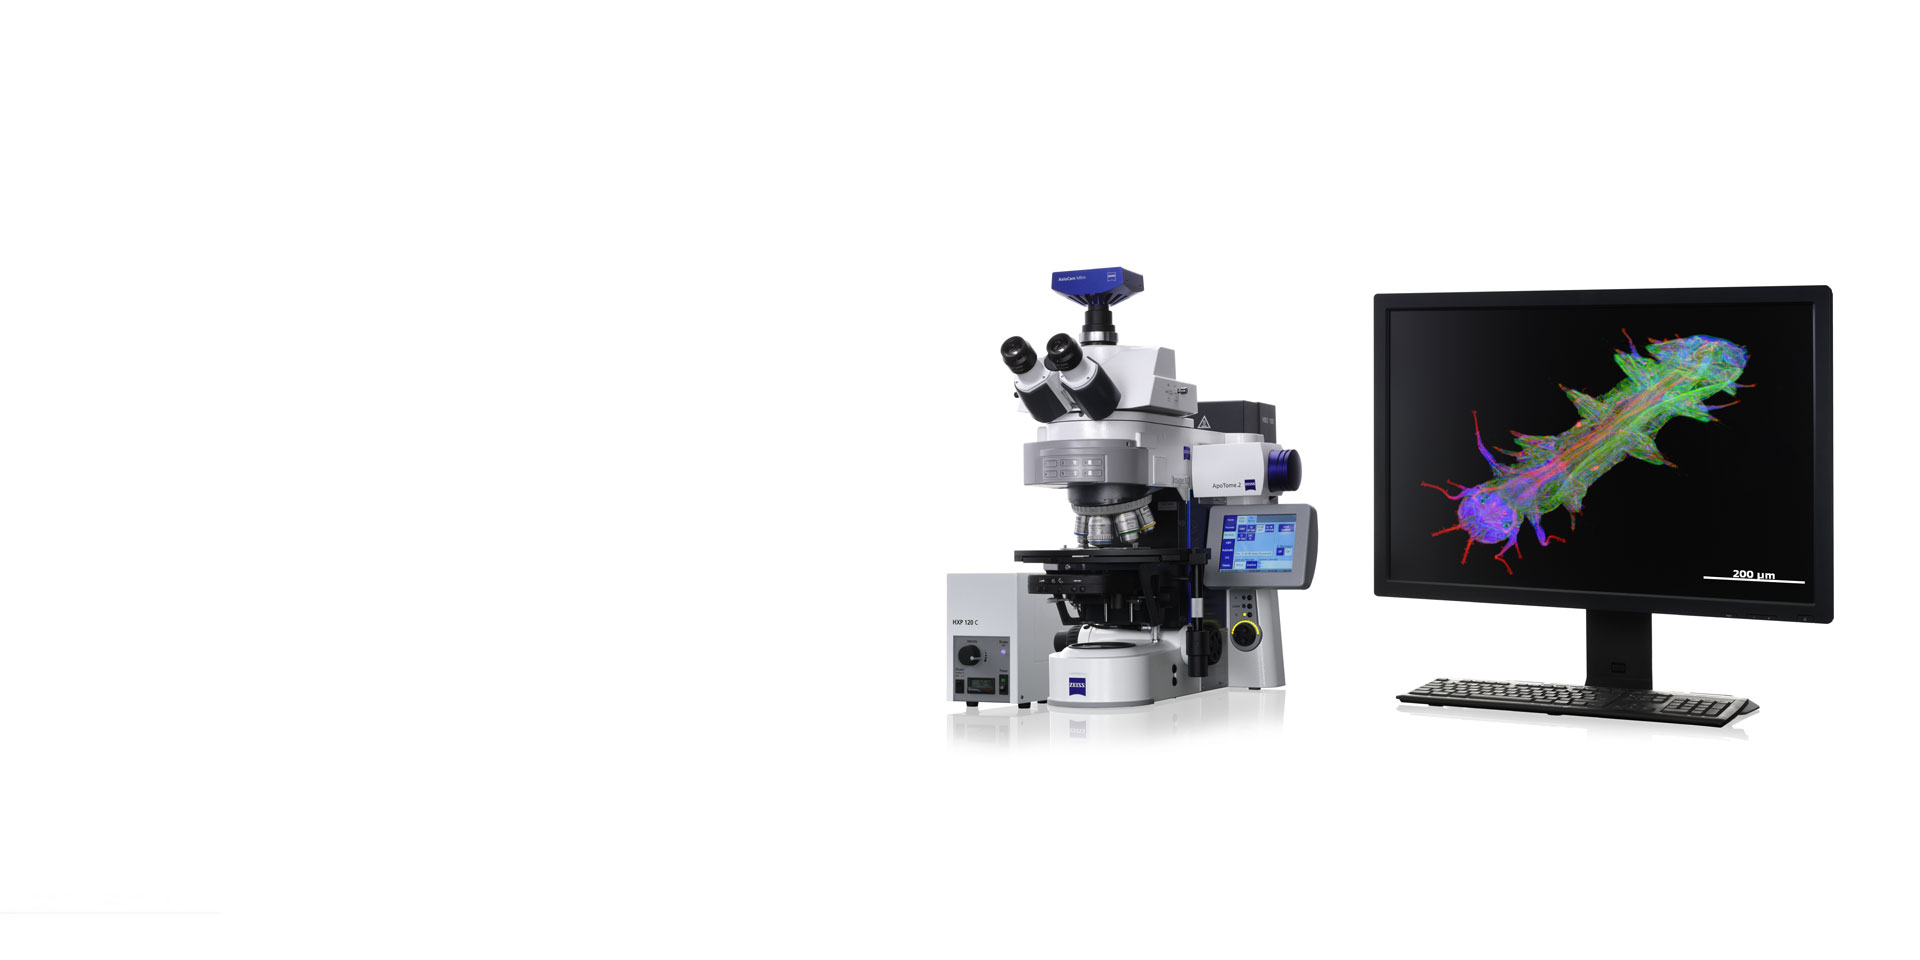 Axio Imager 2 Bio for Neuroscience, Molecular Genetics